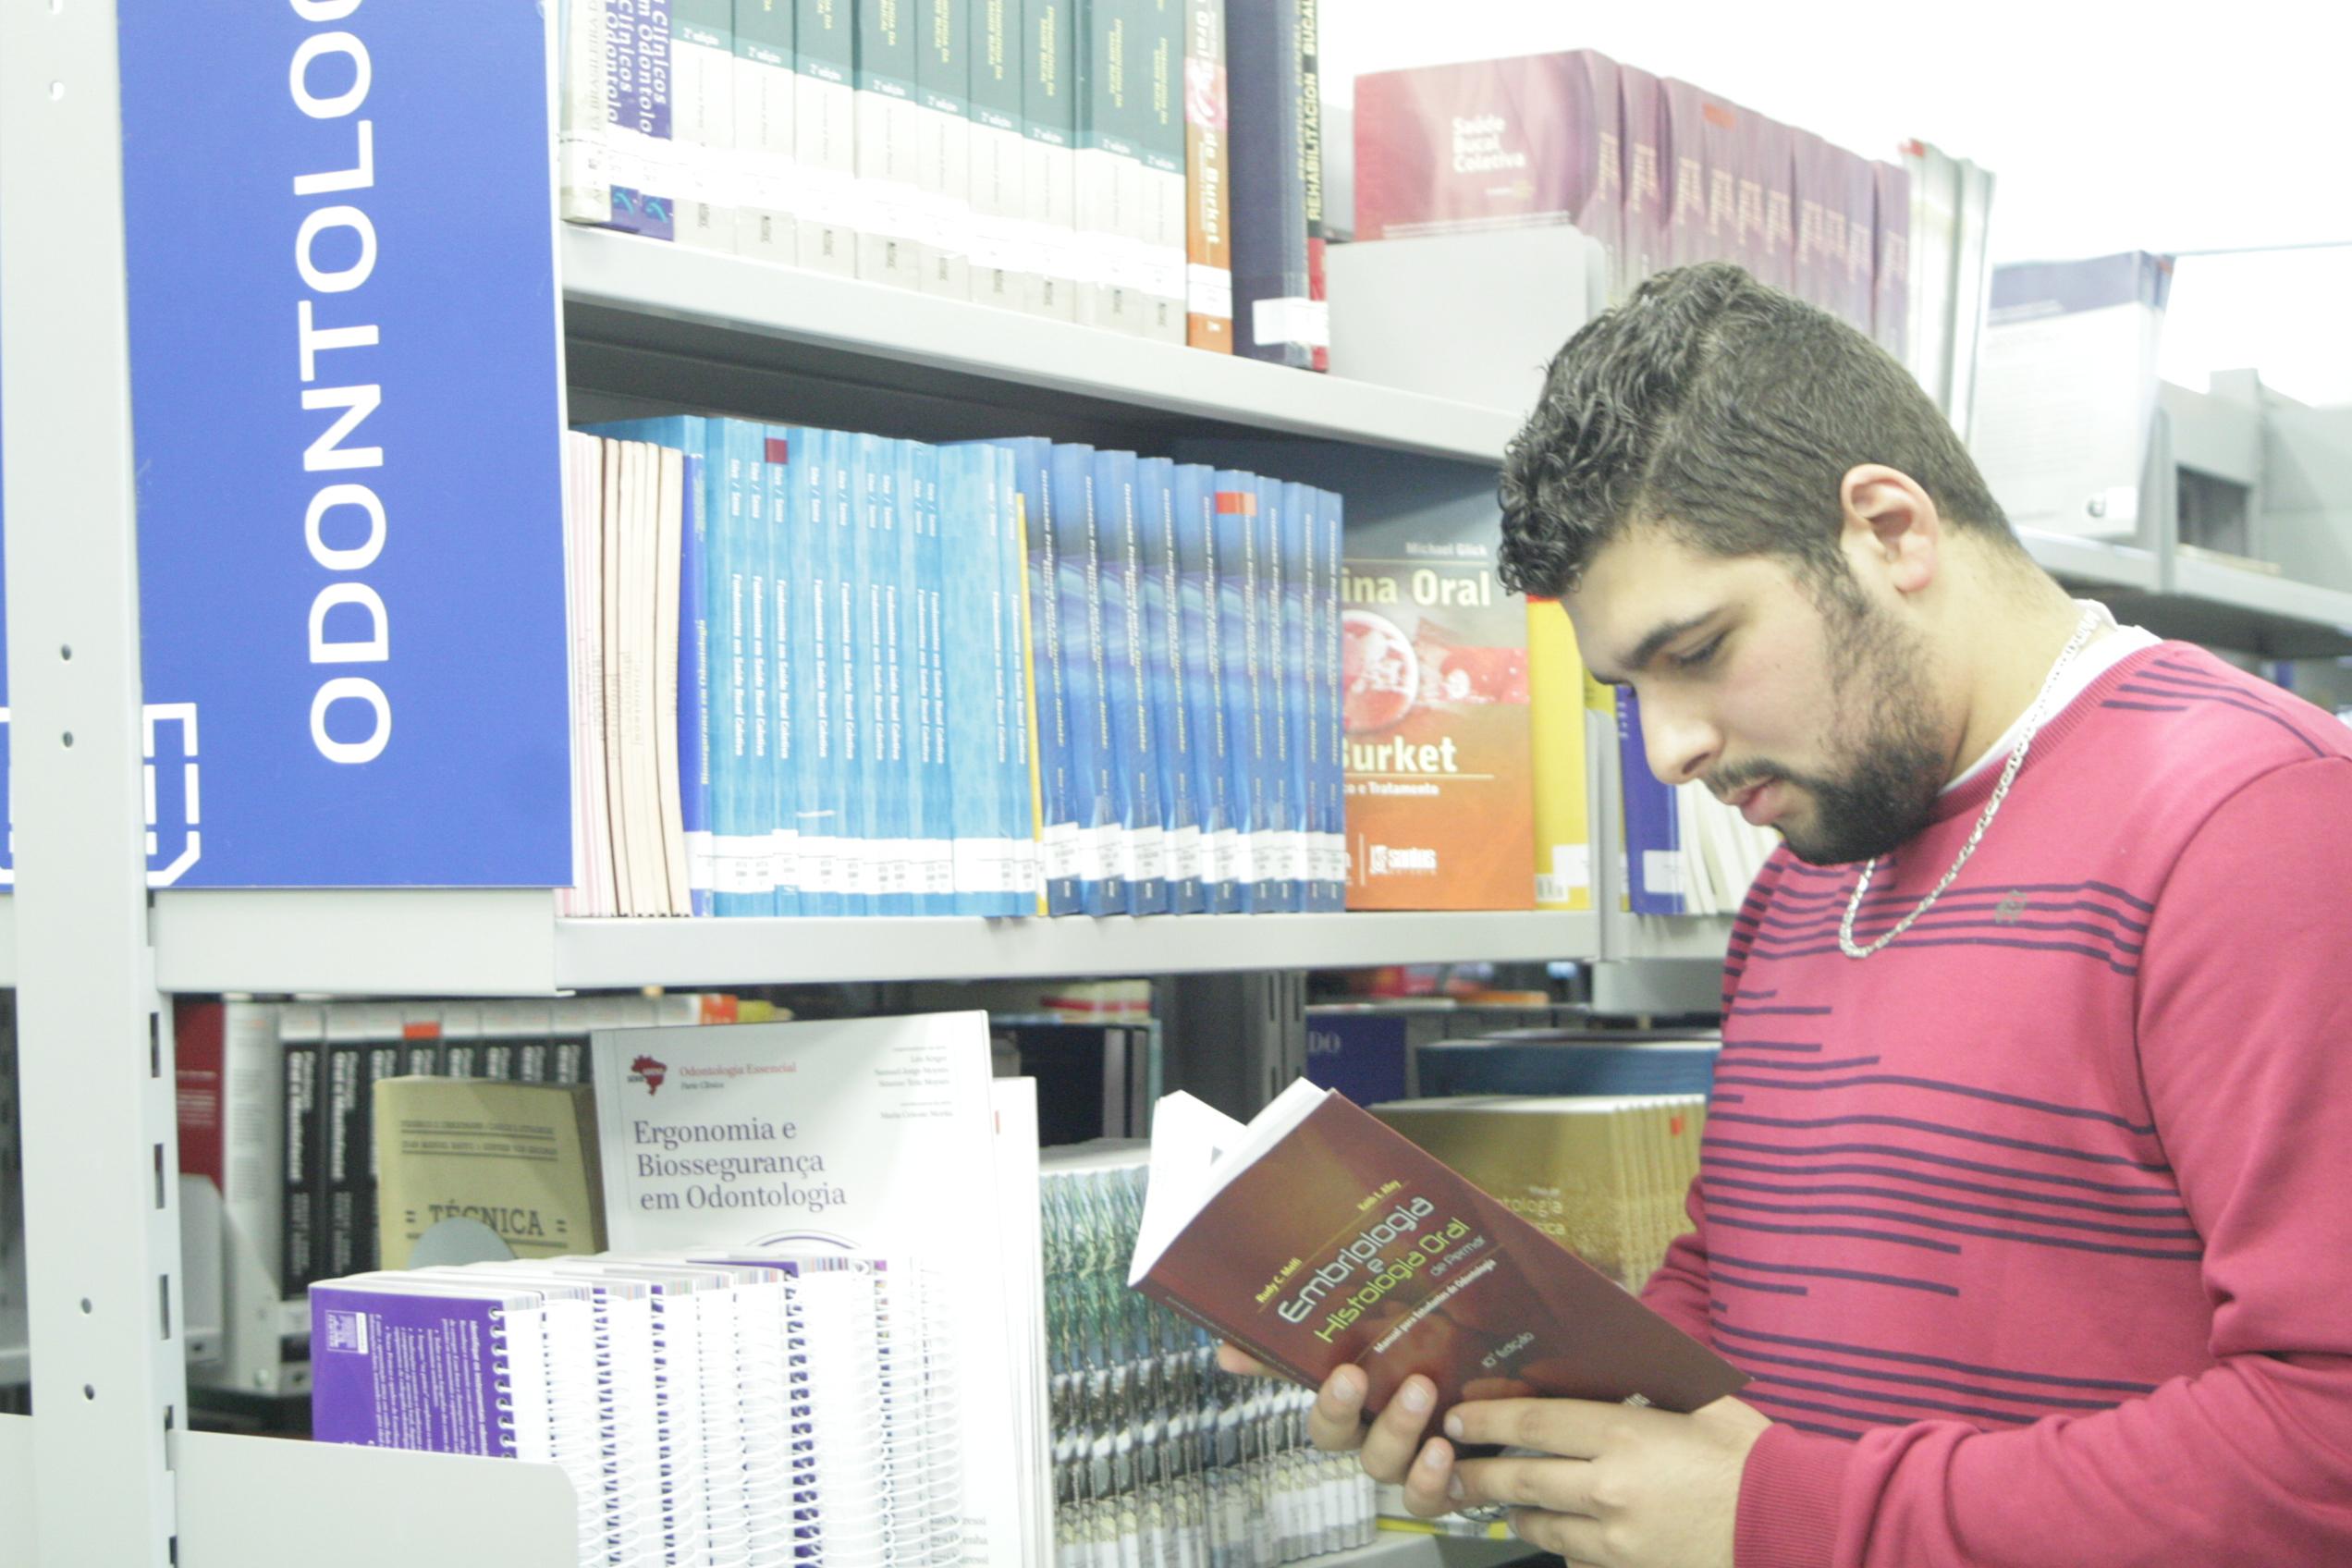 biblioteca-ucpel-odontologia